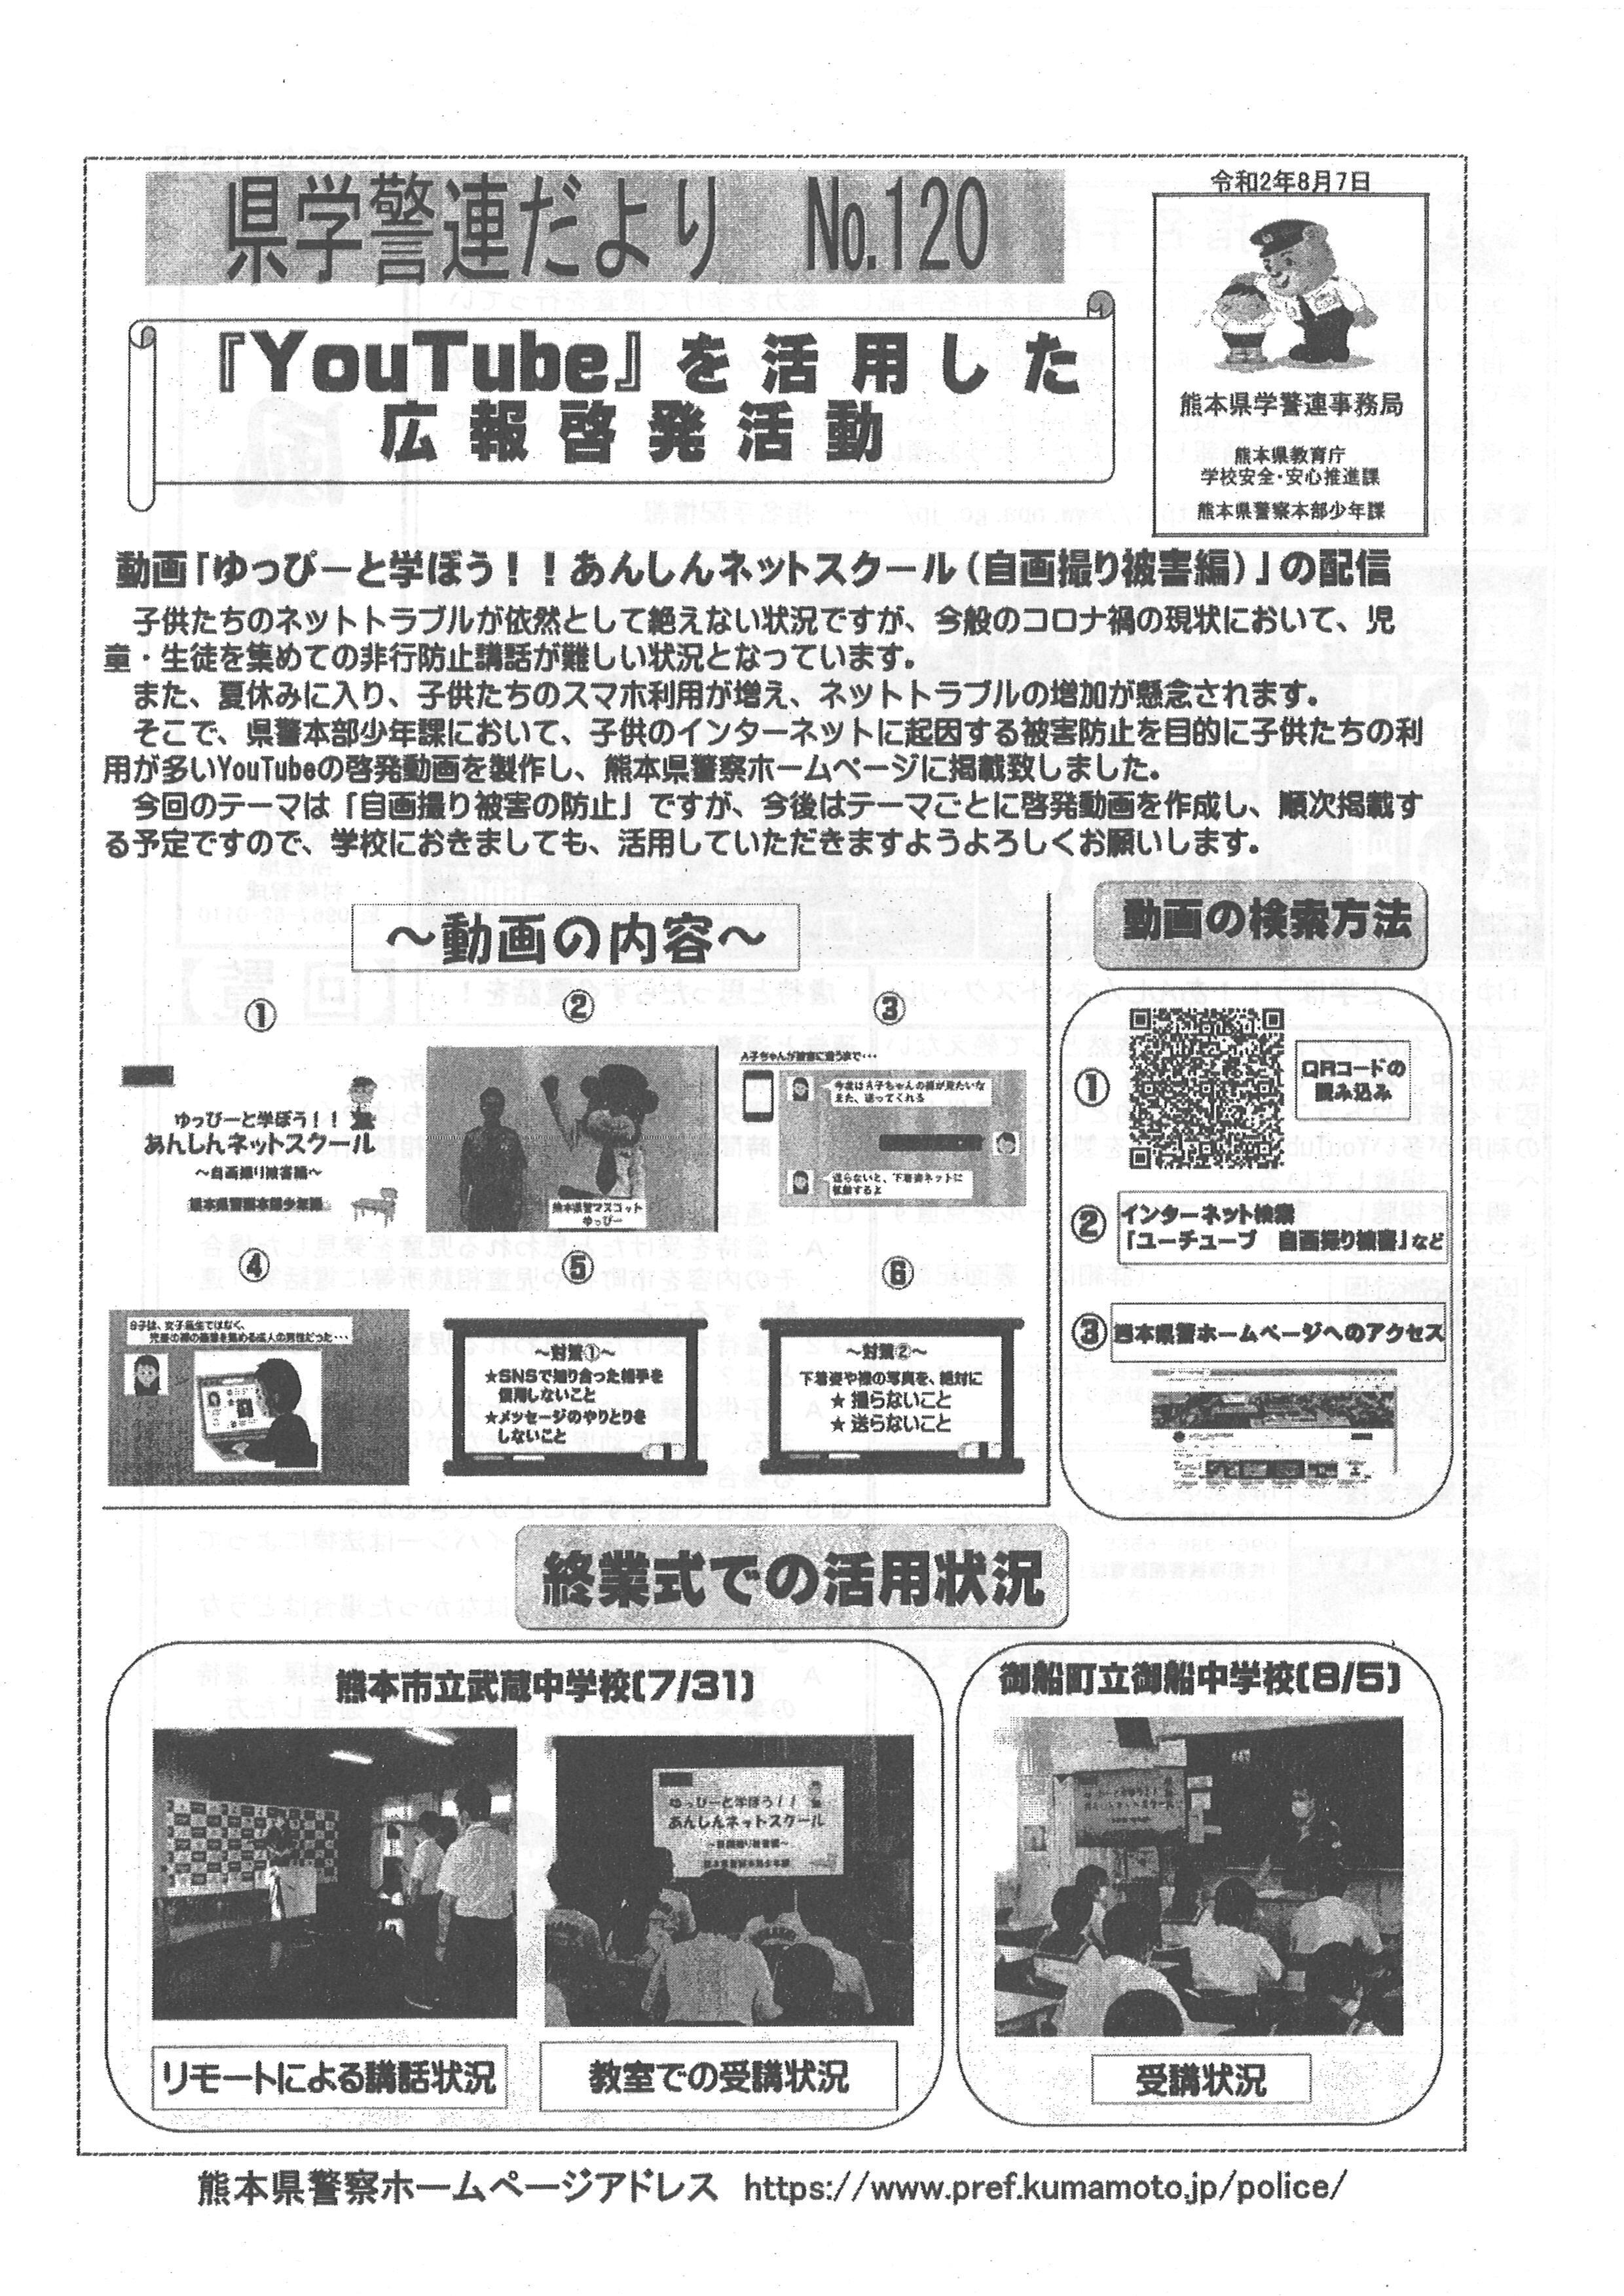 http://www.town.takamori.kumamoto.jp/chosha/somu/upload/2f9bad9eb2c4fcb5c1e6ea0b53596d148a51e082.jpg